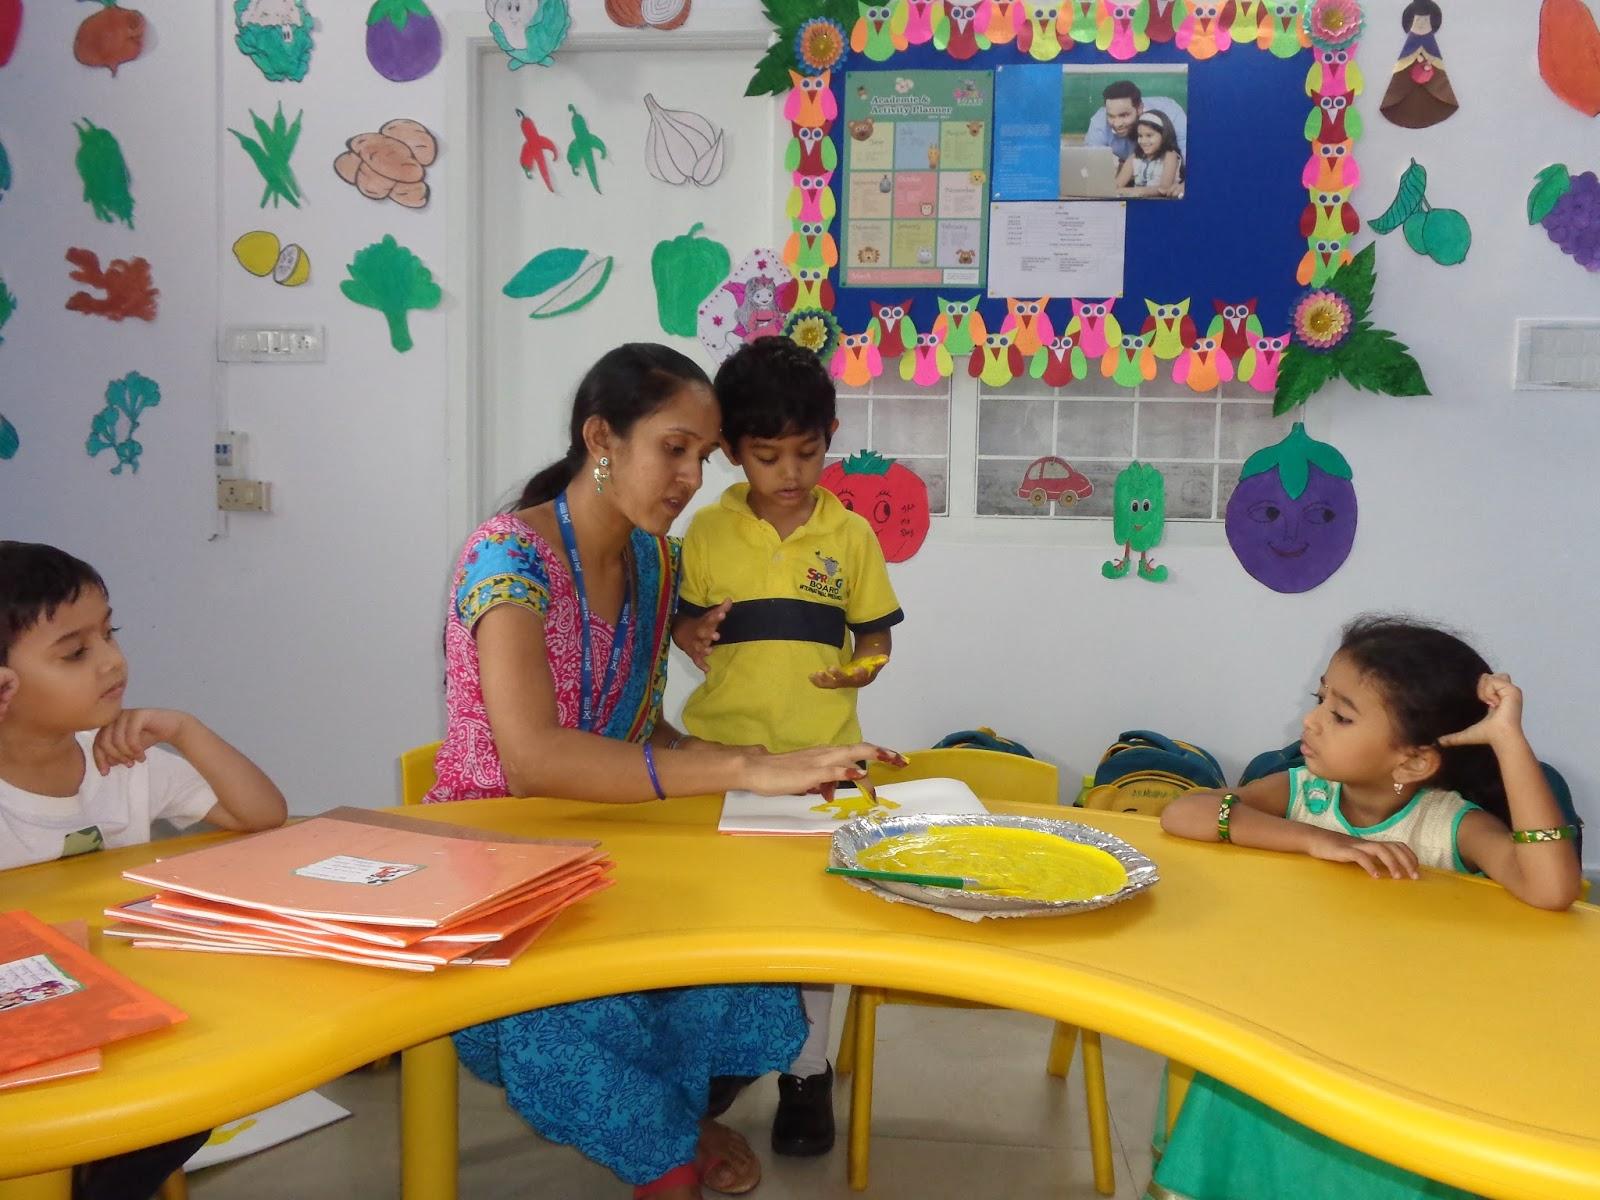 Worksheets For Pre Primary : Springboard international preschool friday creative